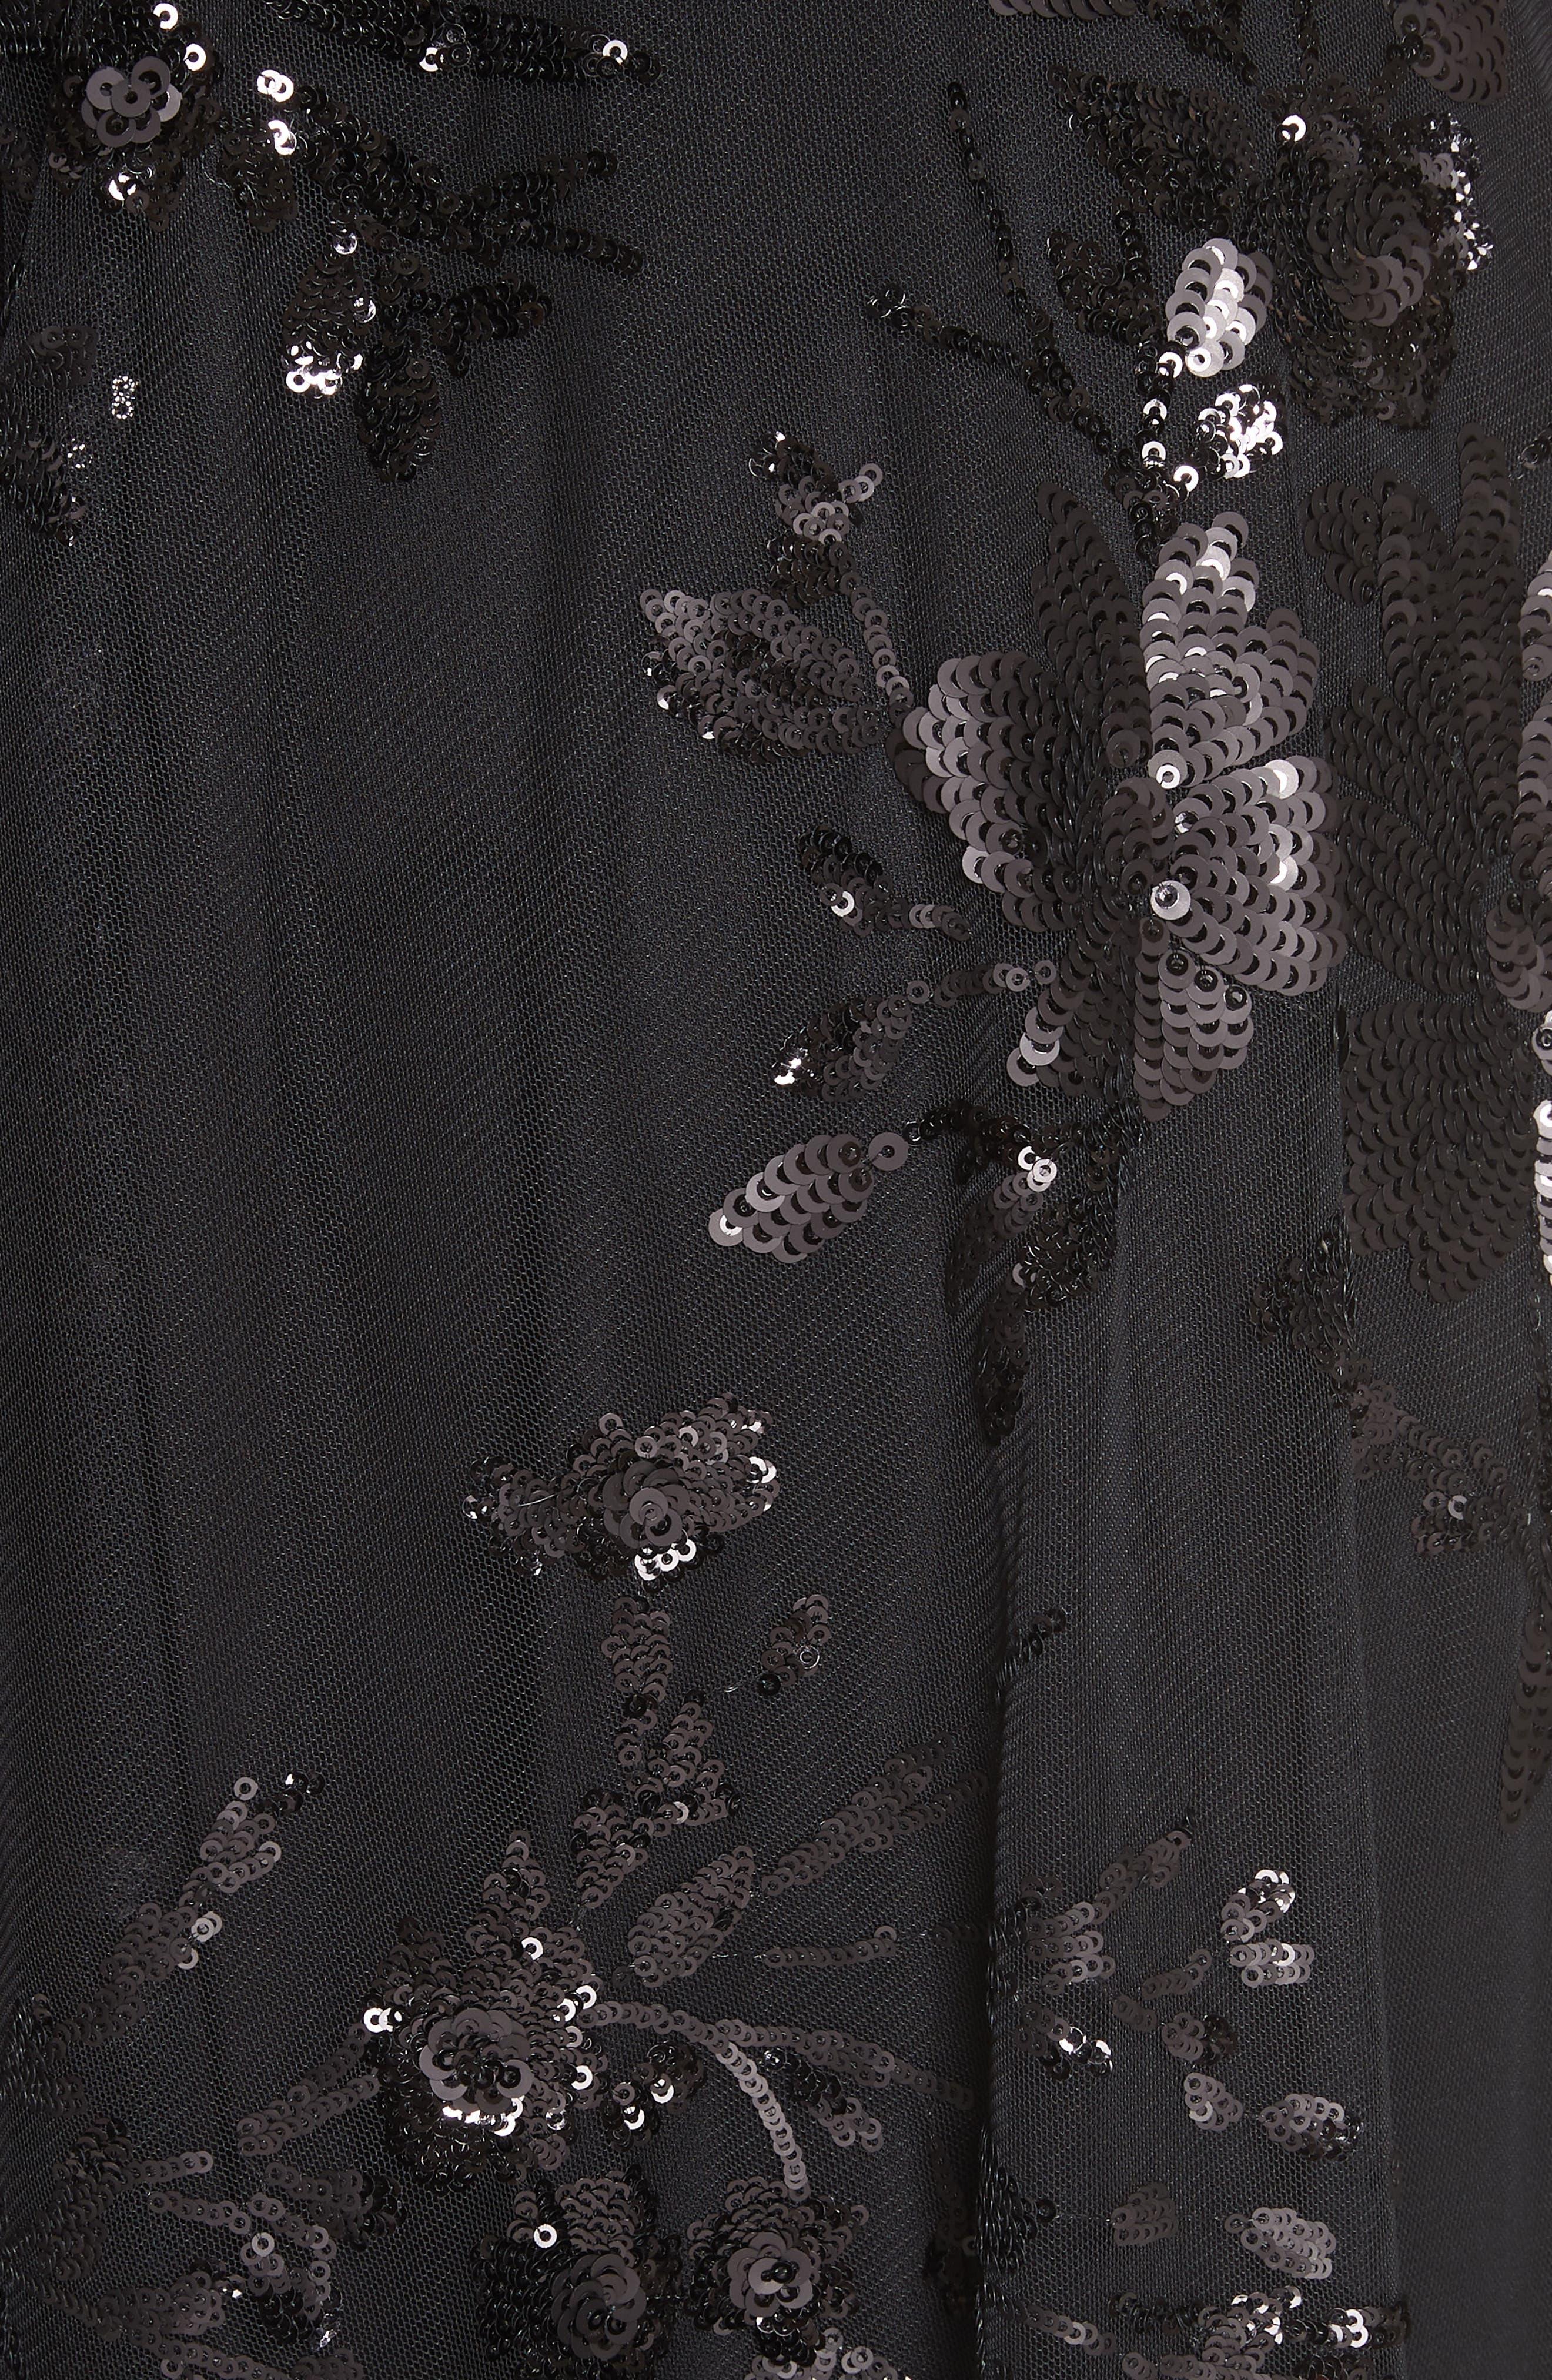 Carmen Marc Valvo Off the Shoulder Gown,                             Alternate thumbnail 6, color,                             Black/ Black